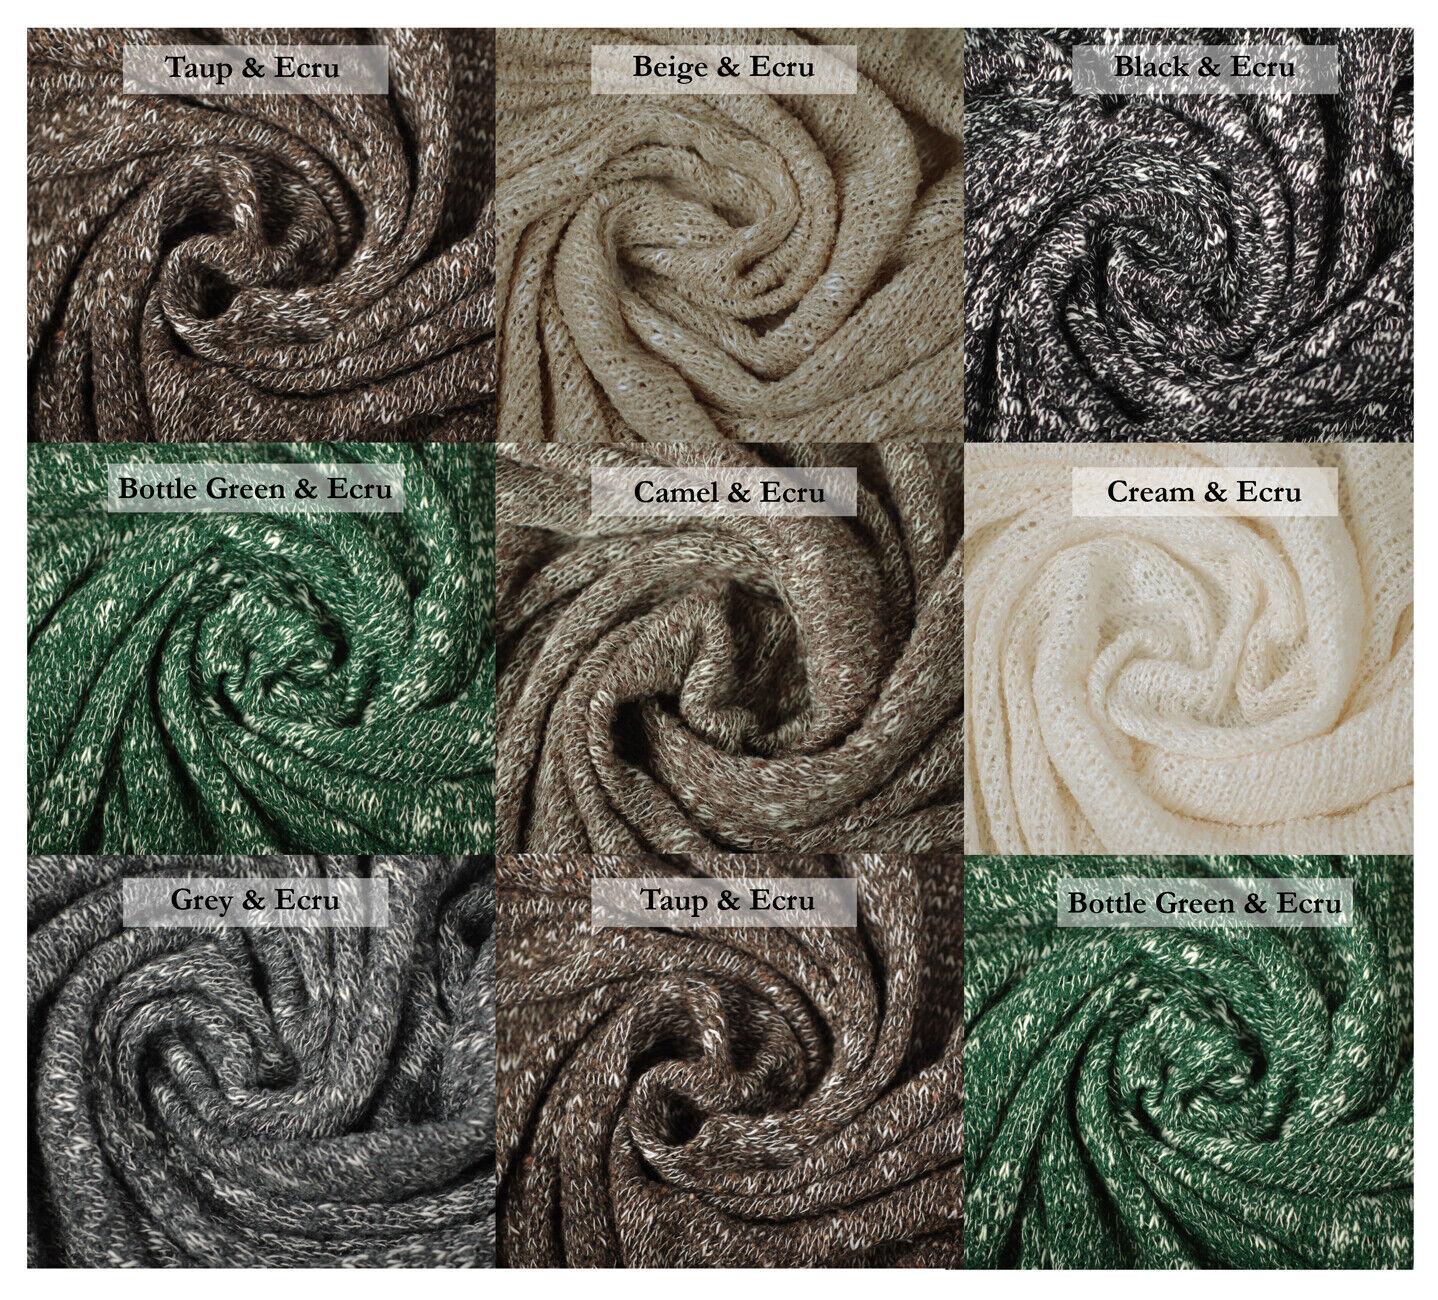 Cotton Slub Marl Knitted Jersey Fabric 2 Tone British Made Knit /& Purl Design